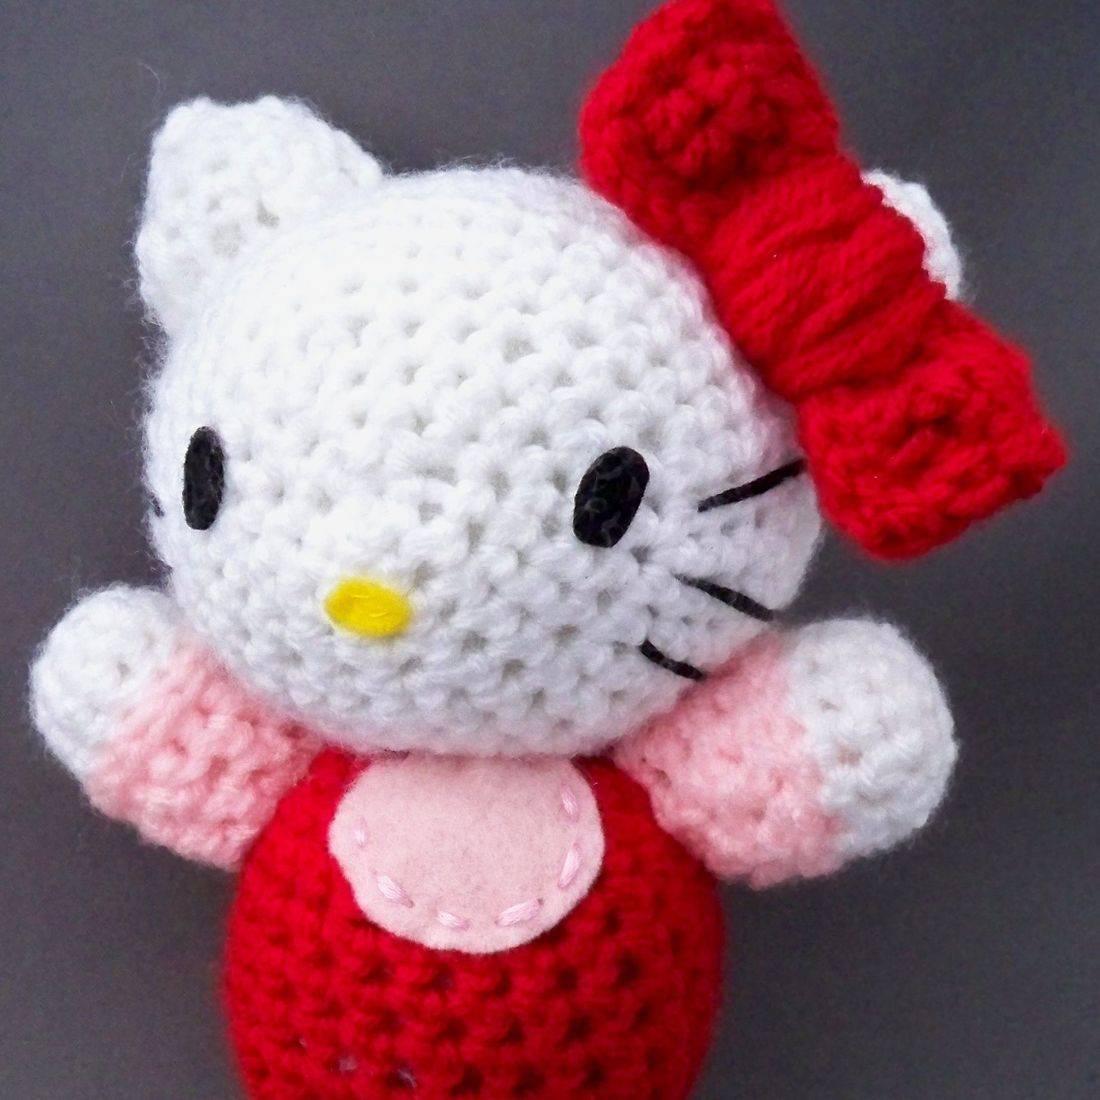 Hello Kitty, HK, Japan, Japanese, feline, anime, otaku, nerd, geek, crochet, amigurumi, plush, doll